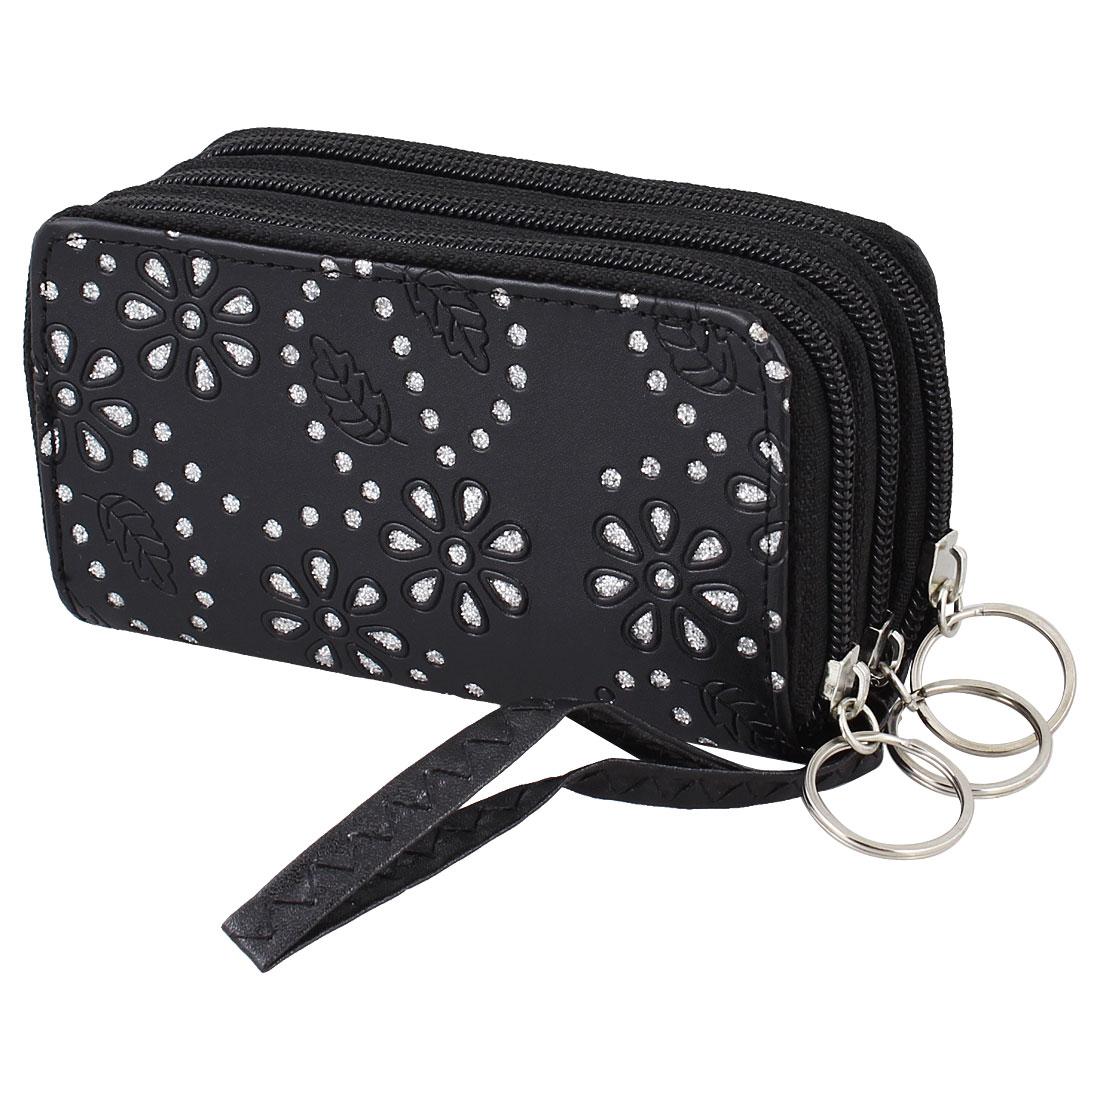 Women Keys Holder Black Floral Leaf 4 Slots Zipper Wallet Purse Handbag Pouch